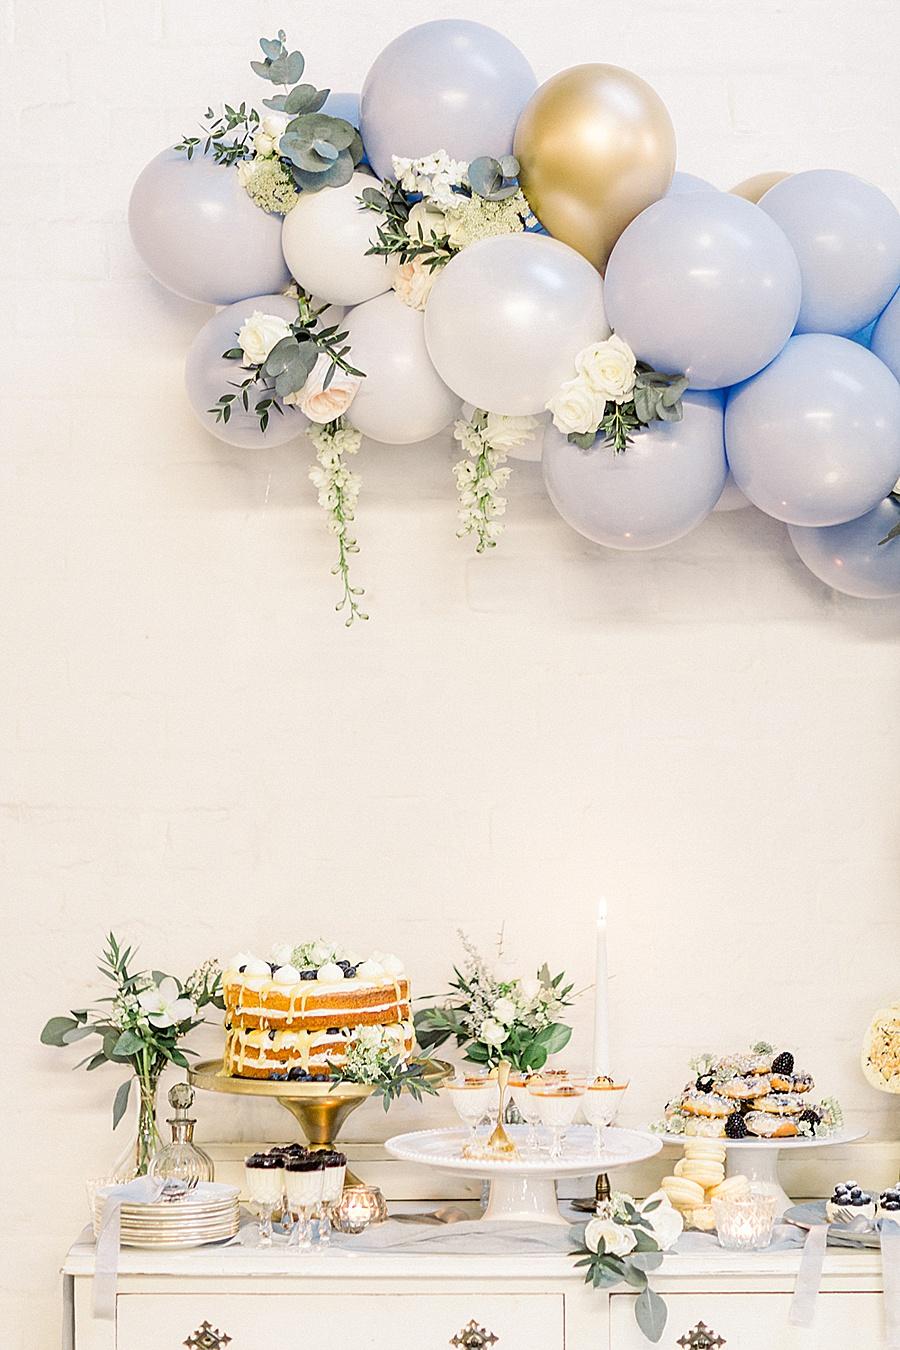 Barn venue transformed for a beautiful modern wedding, photo credit Terri and Lori (32)